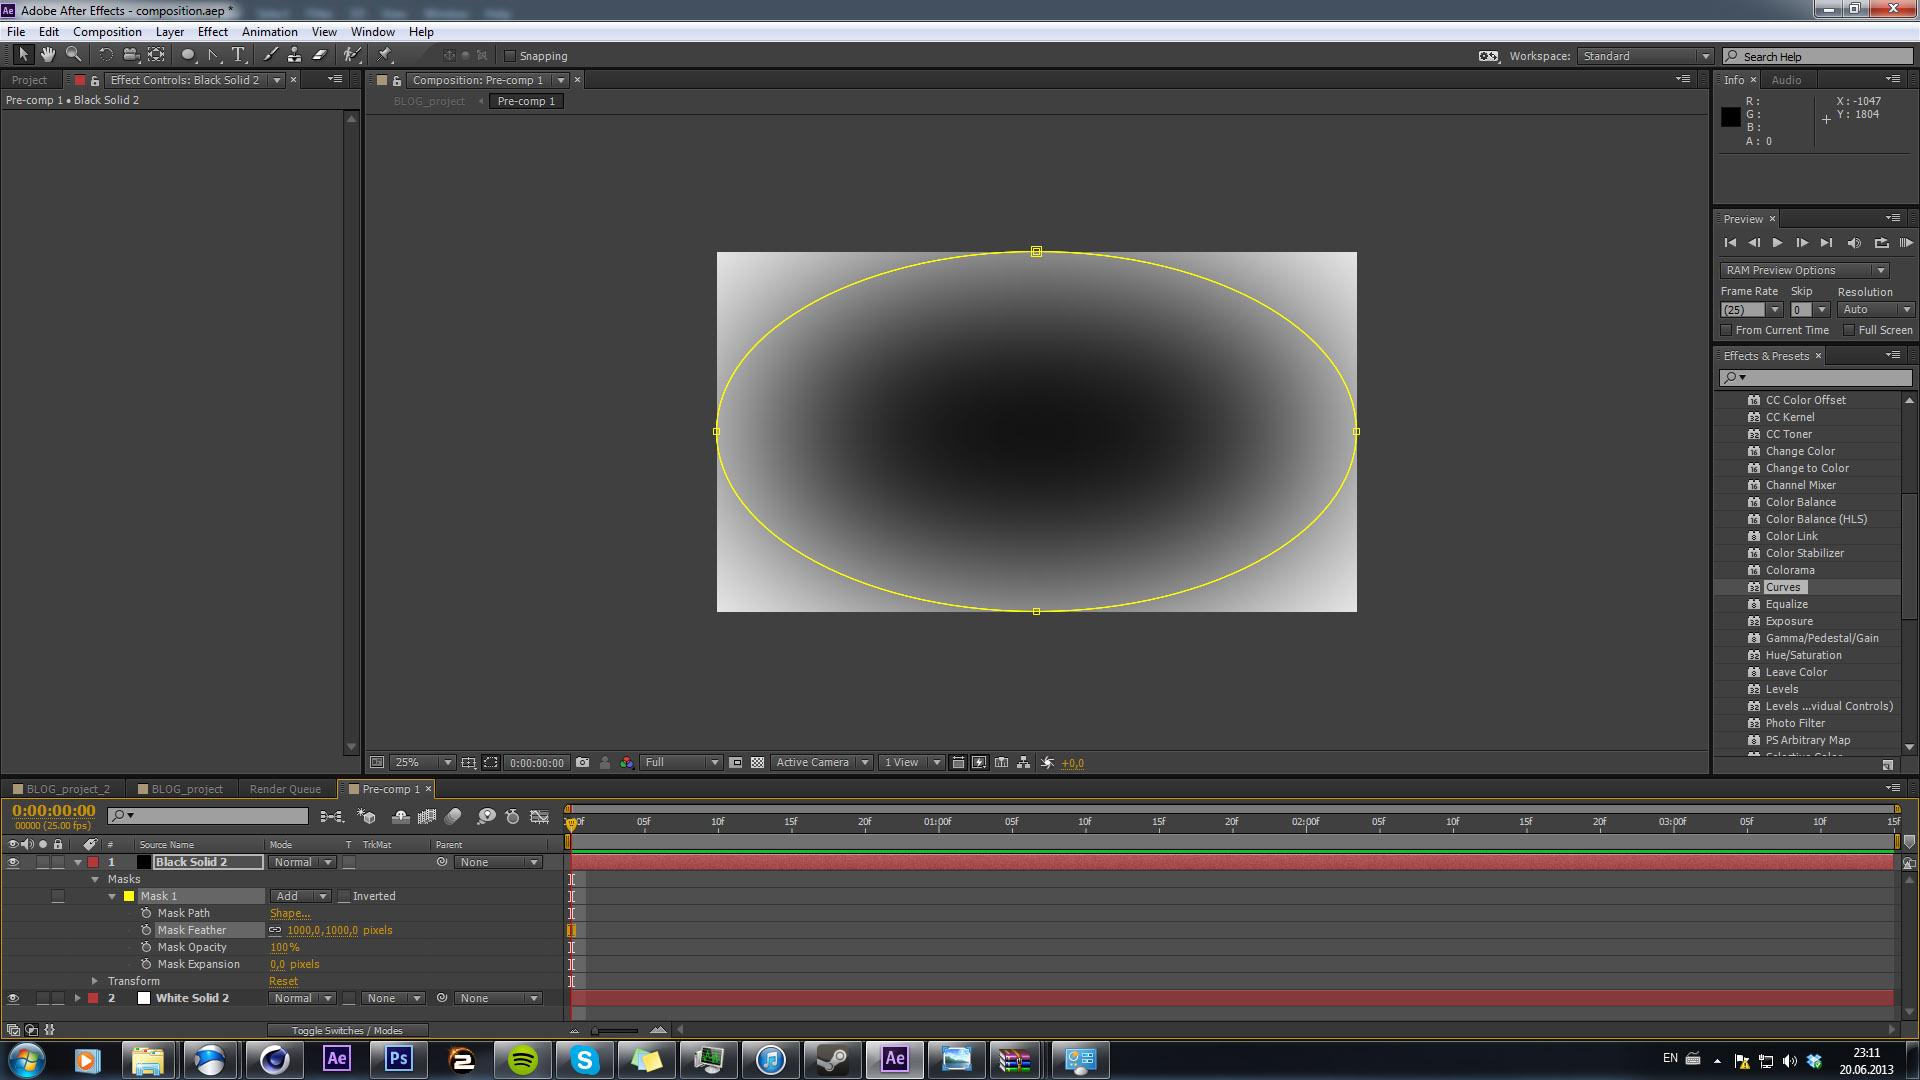 Cinema 4D Lite & After Effects CC - CINEWARE im Praxistest